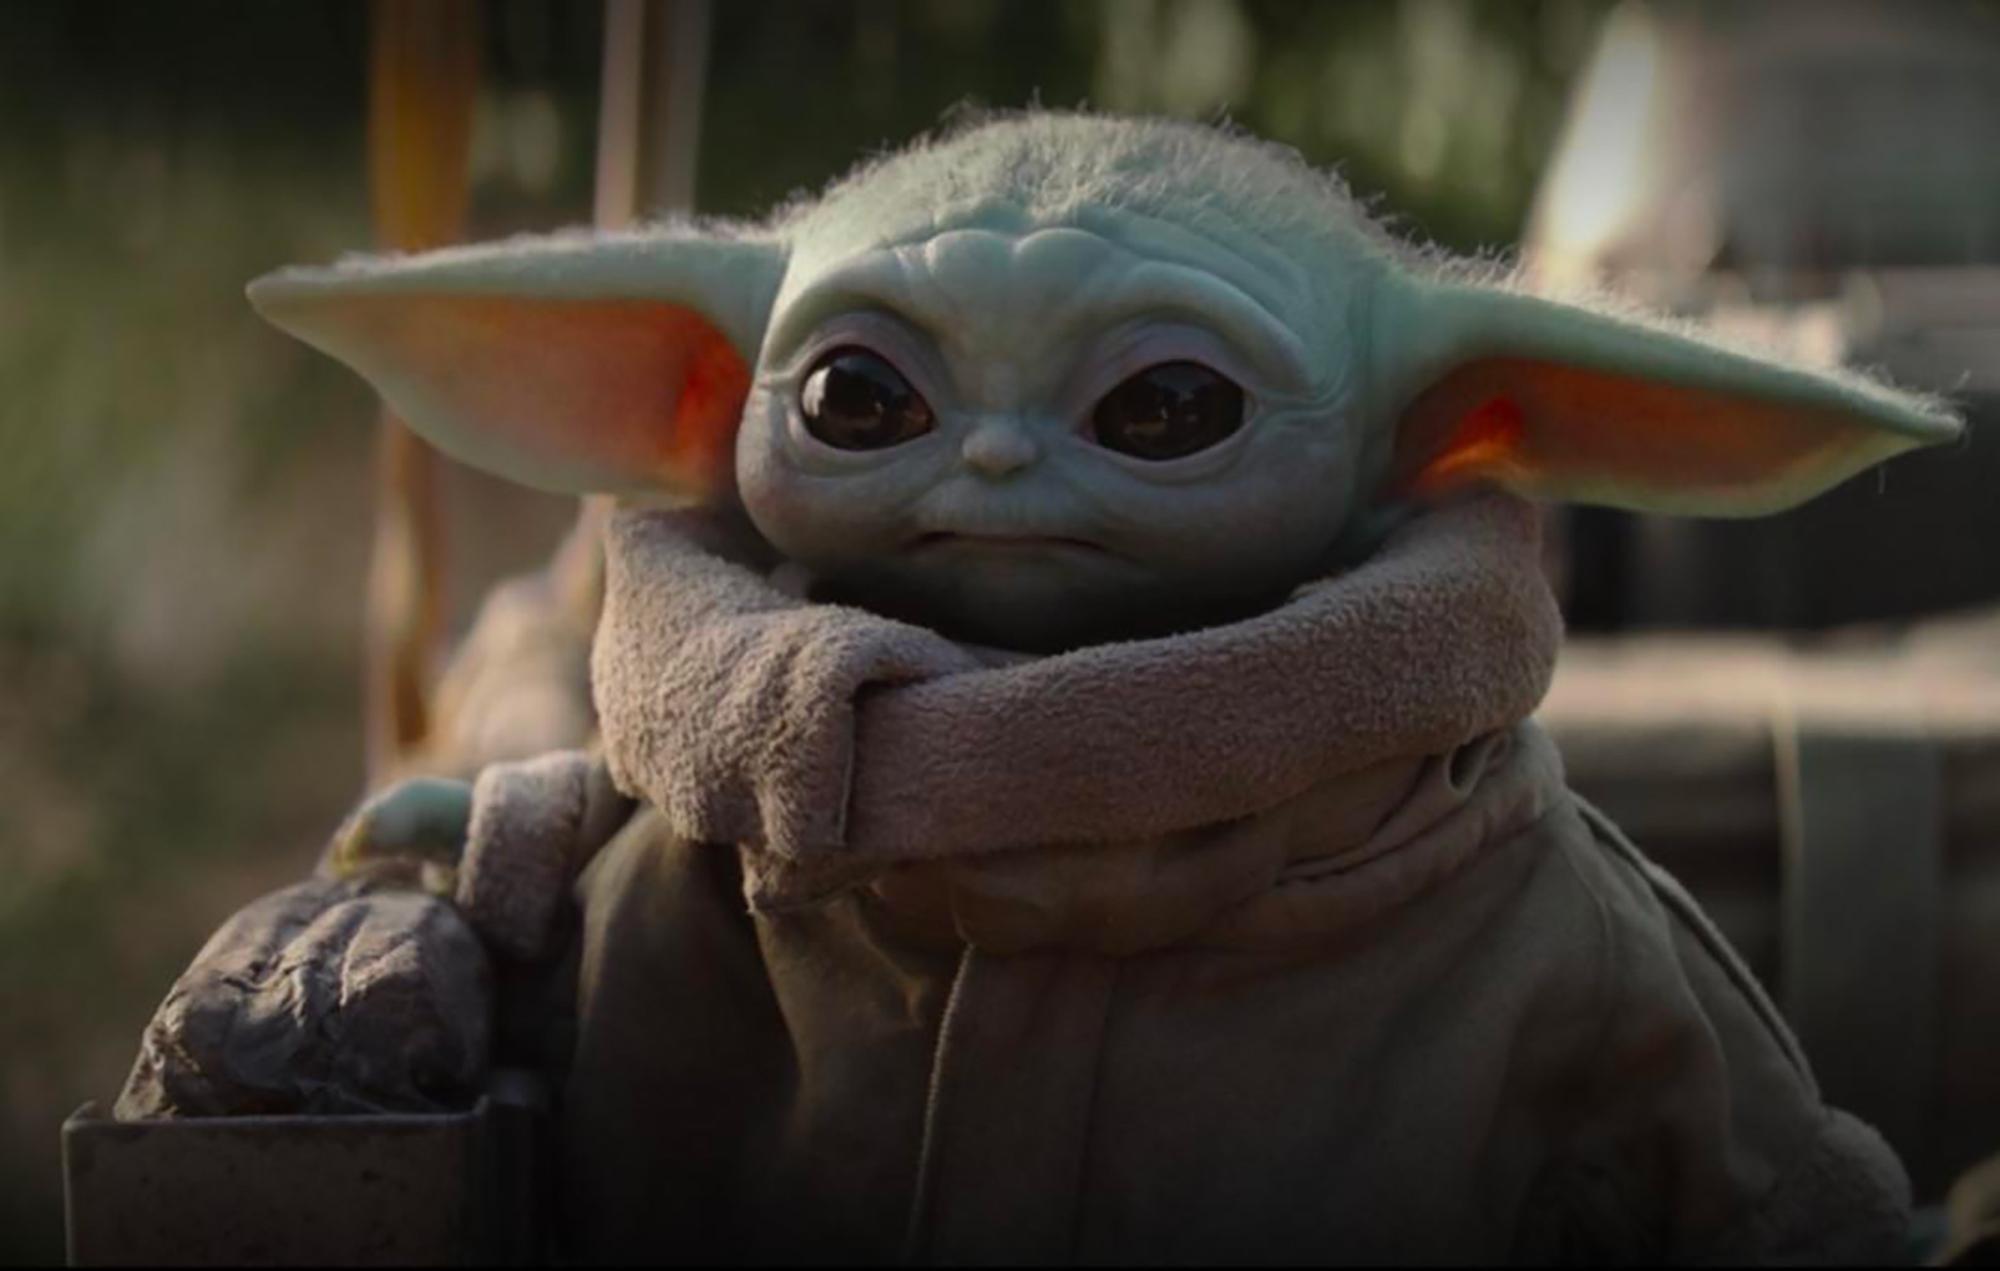 Baby Yoda — whose real name is Grogu — in 'The Mandalorian'